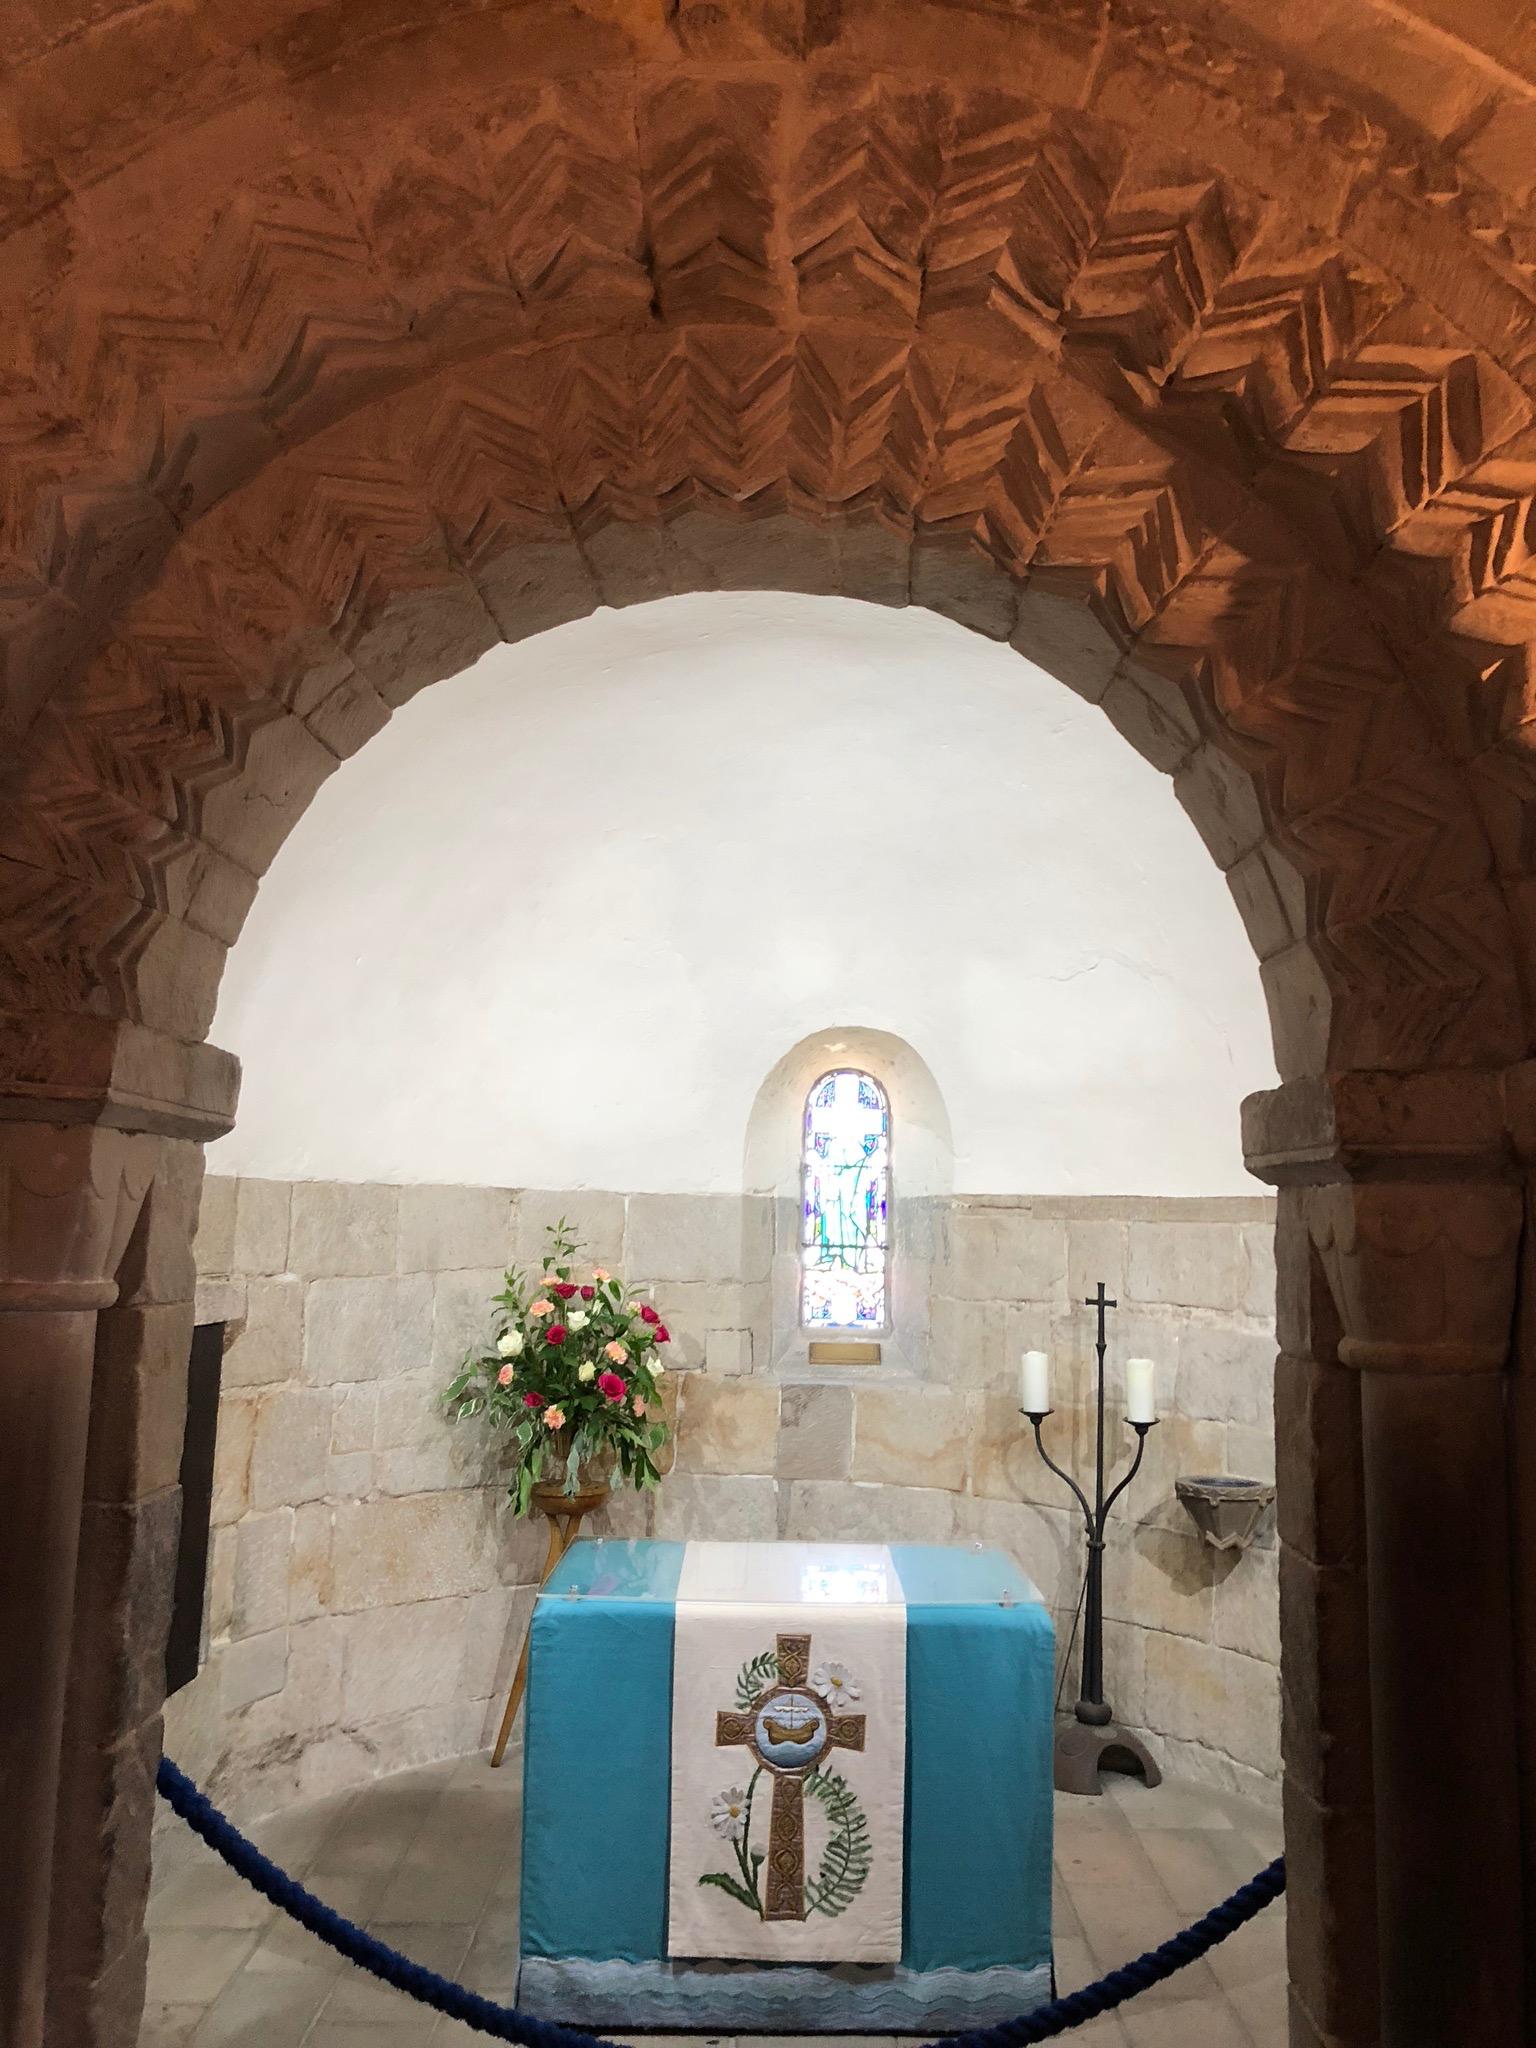 #stmargaret, #edinburghcastle, #oldestbuilding, #edinburgh, #castle, #chapel